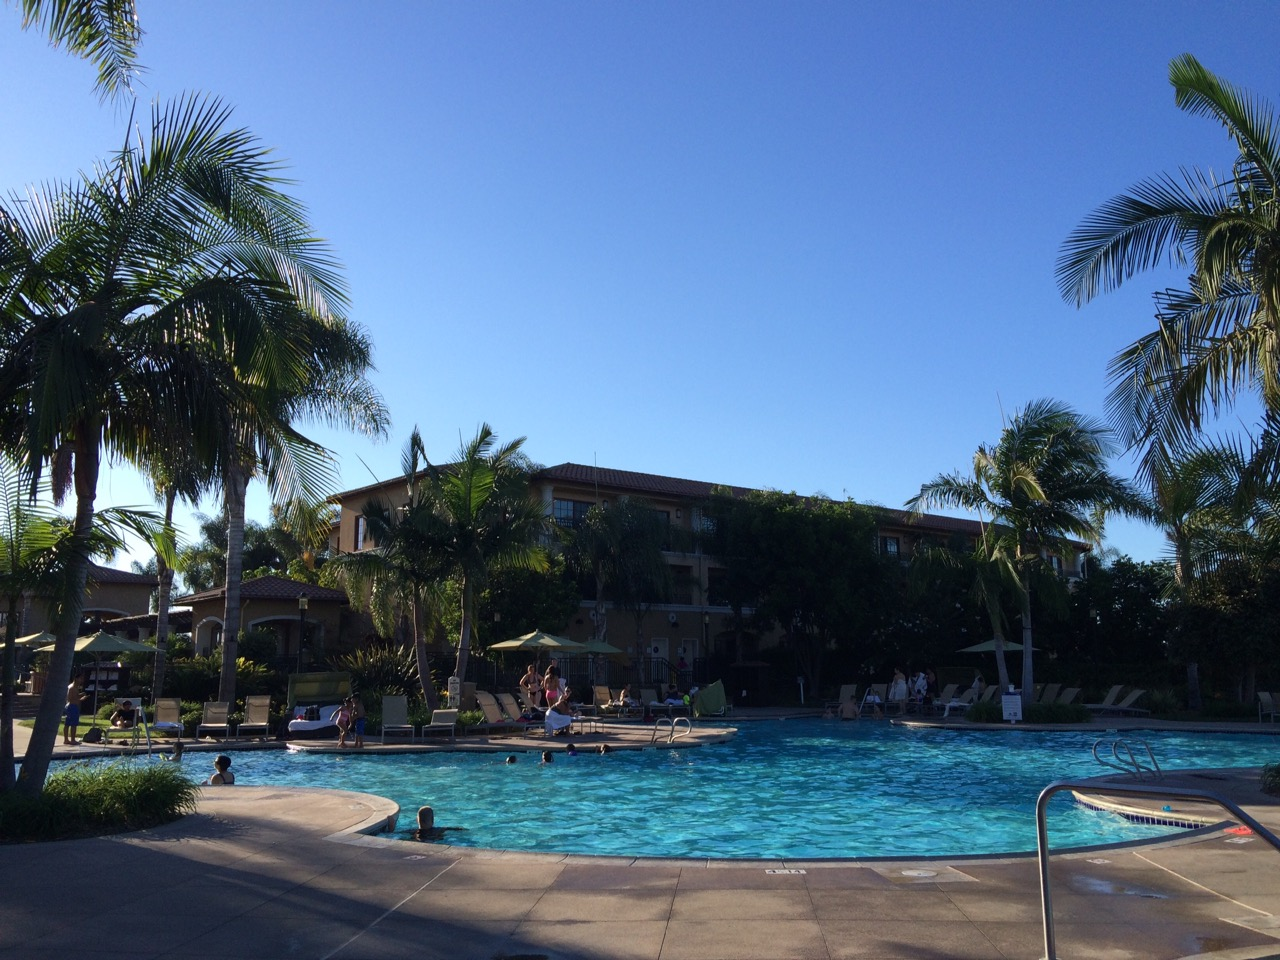 sheraton-carlsbad-pool